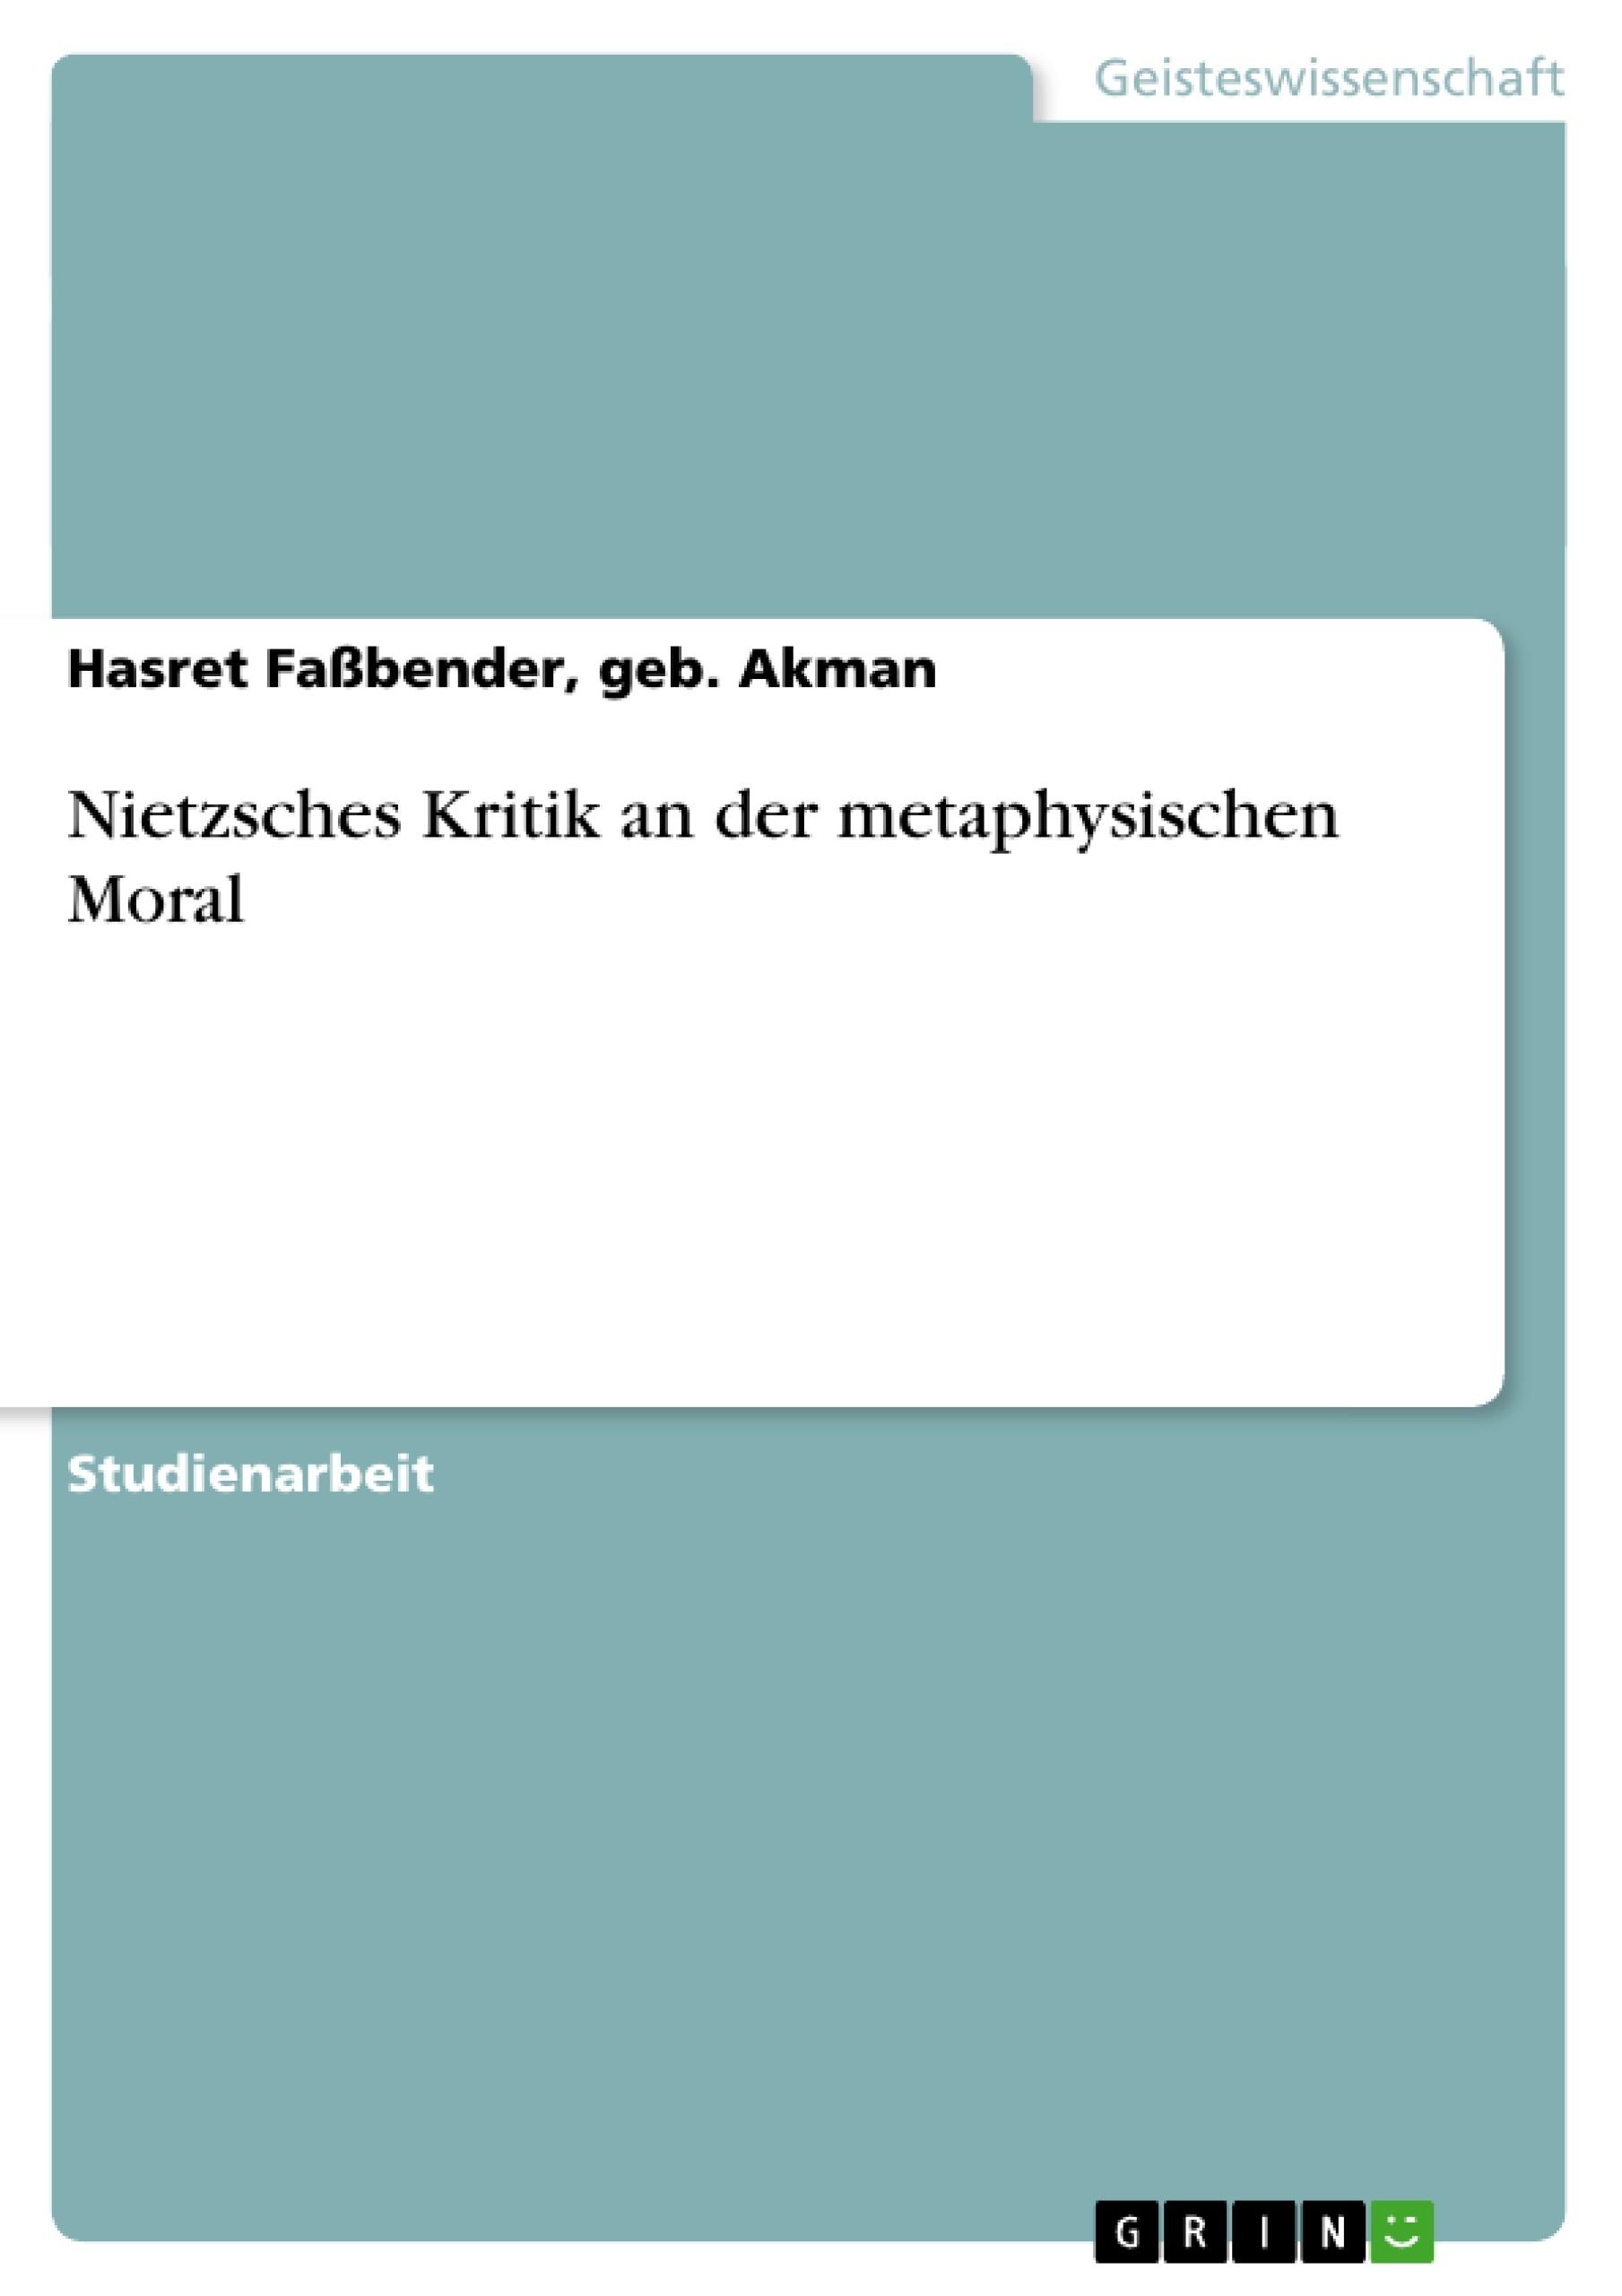 Titel: Nietzsches Kritik an der metaphysischen Moral